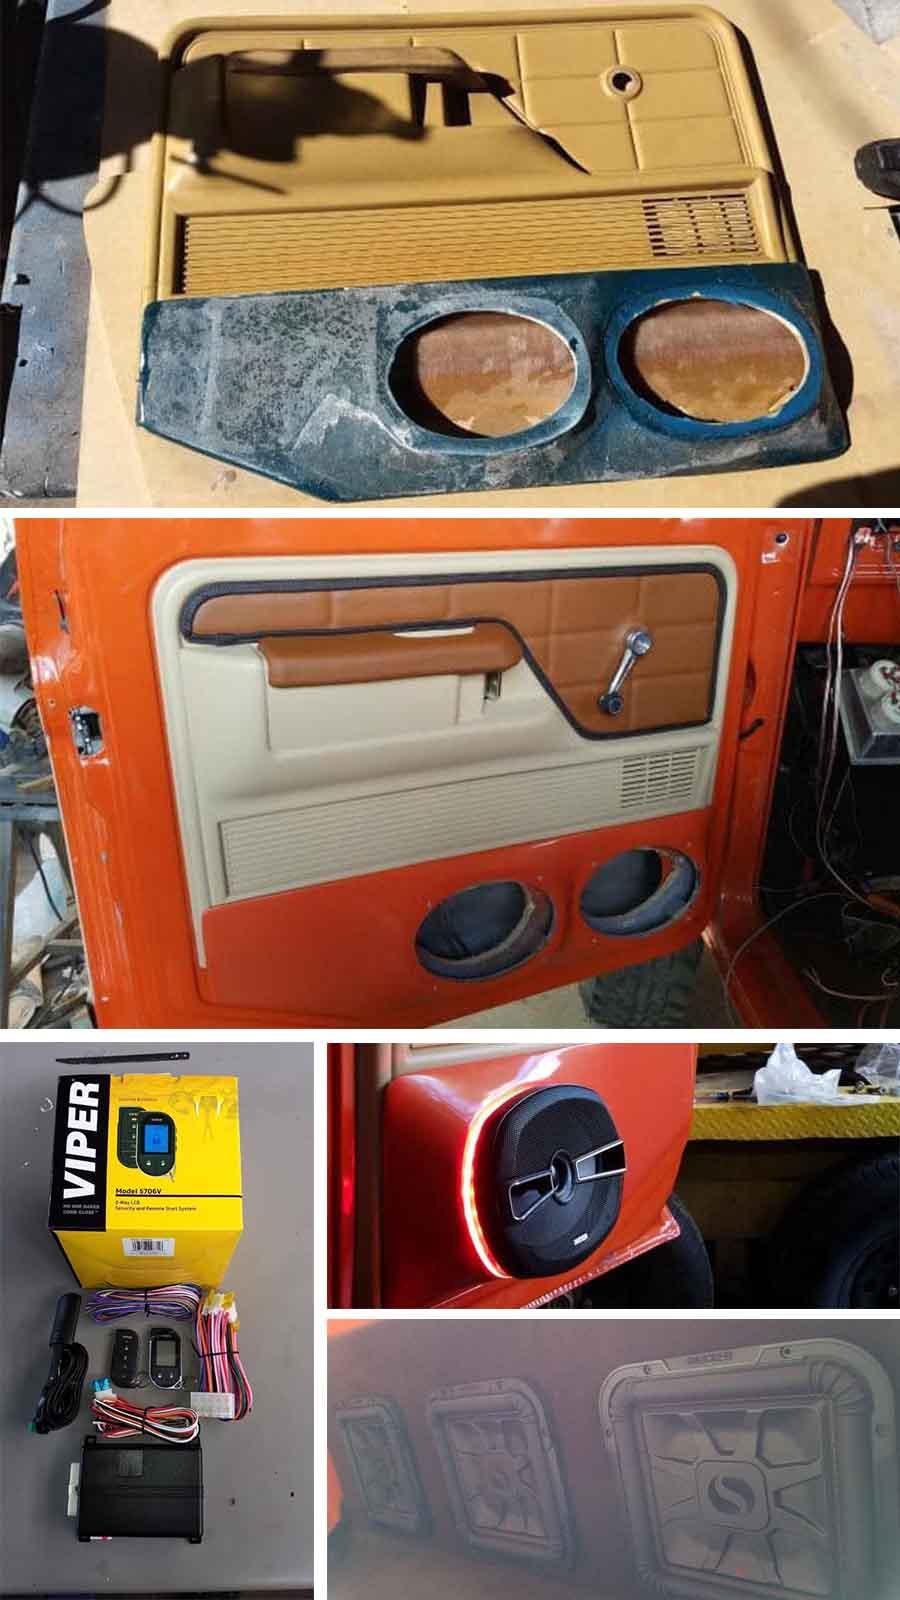 1977 Ford F250 4x4 Crew Cab Orange & Cream Pearl  9.jpg